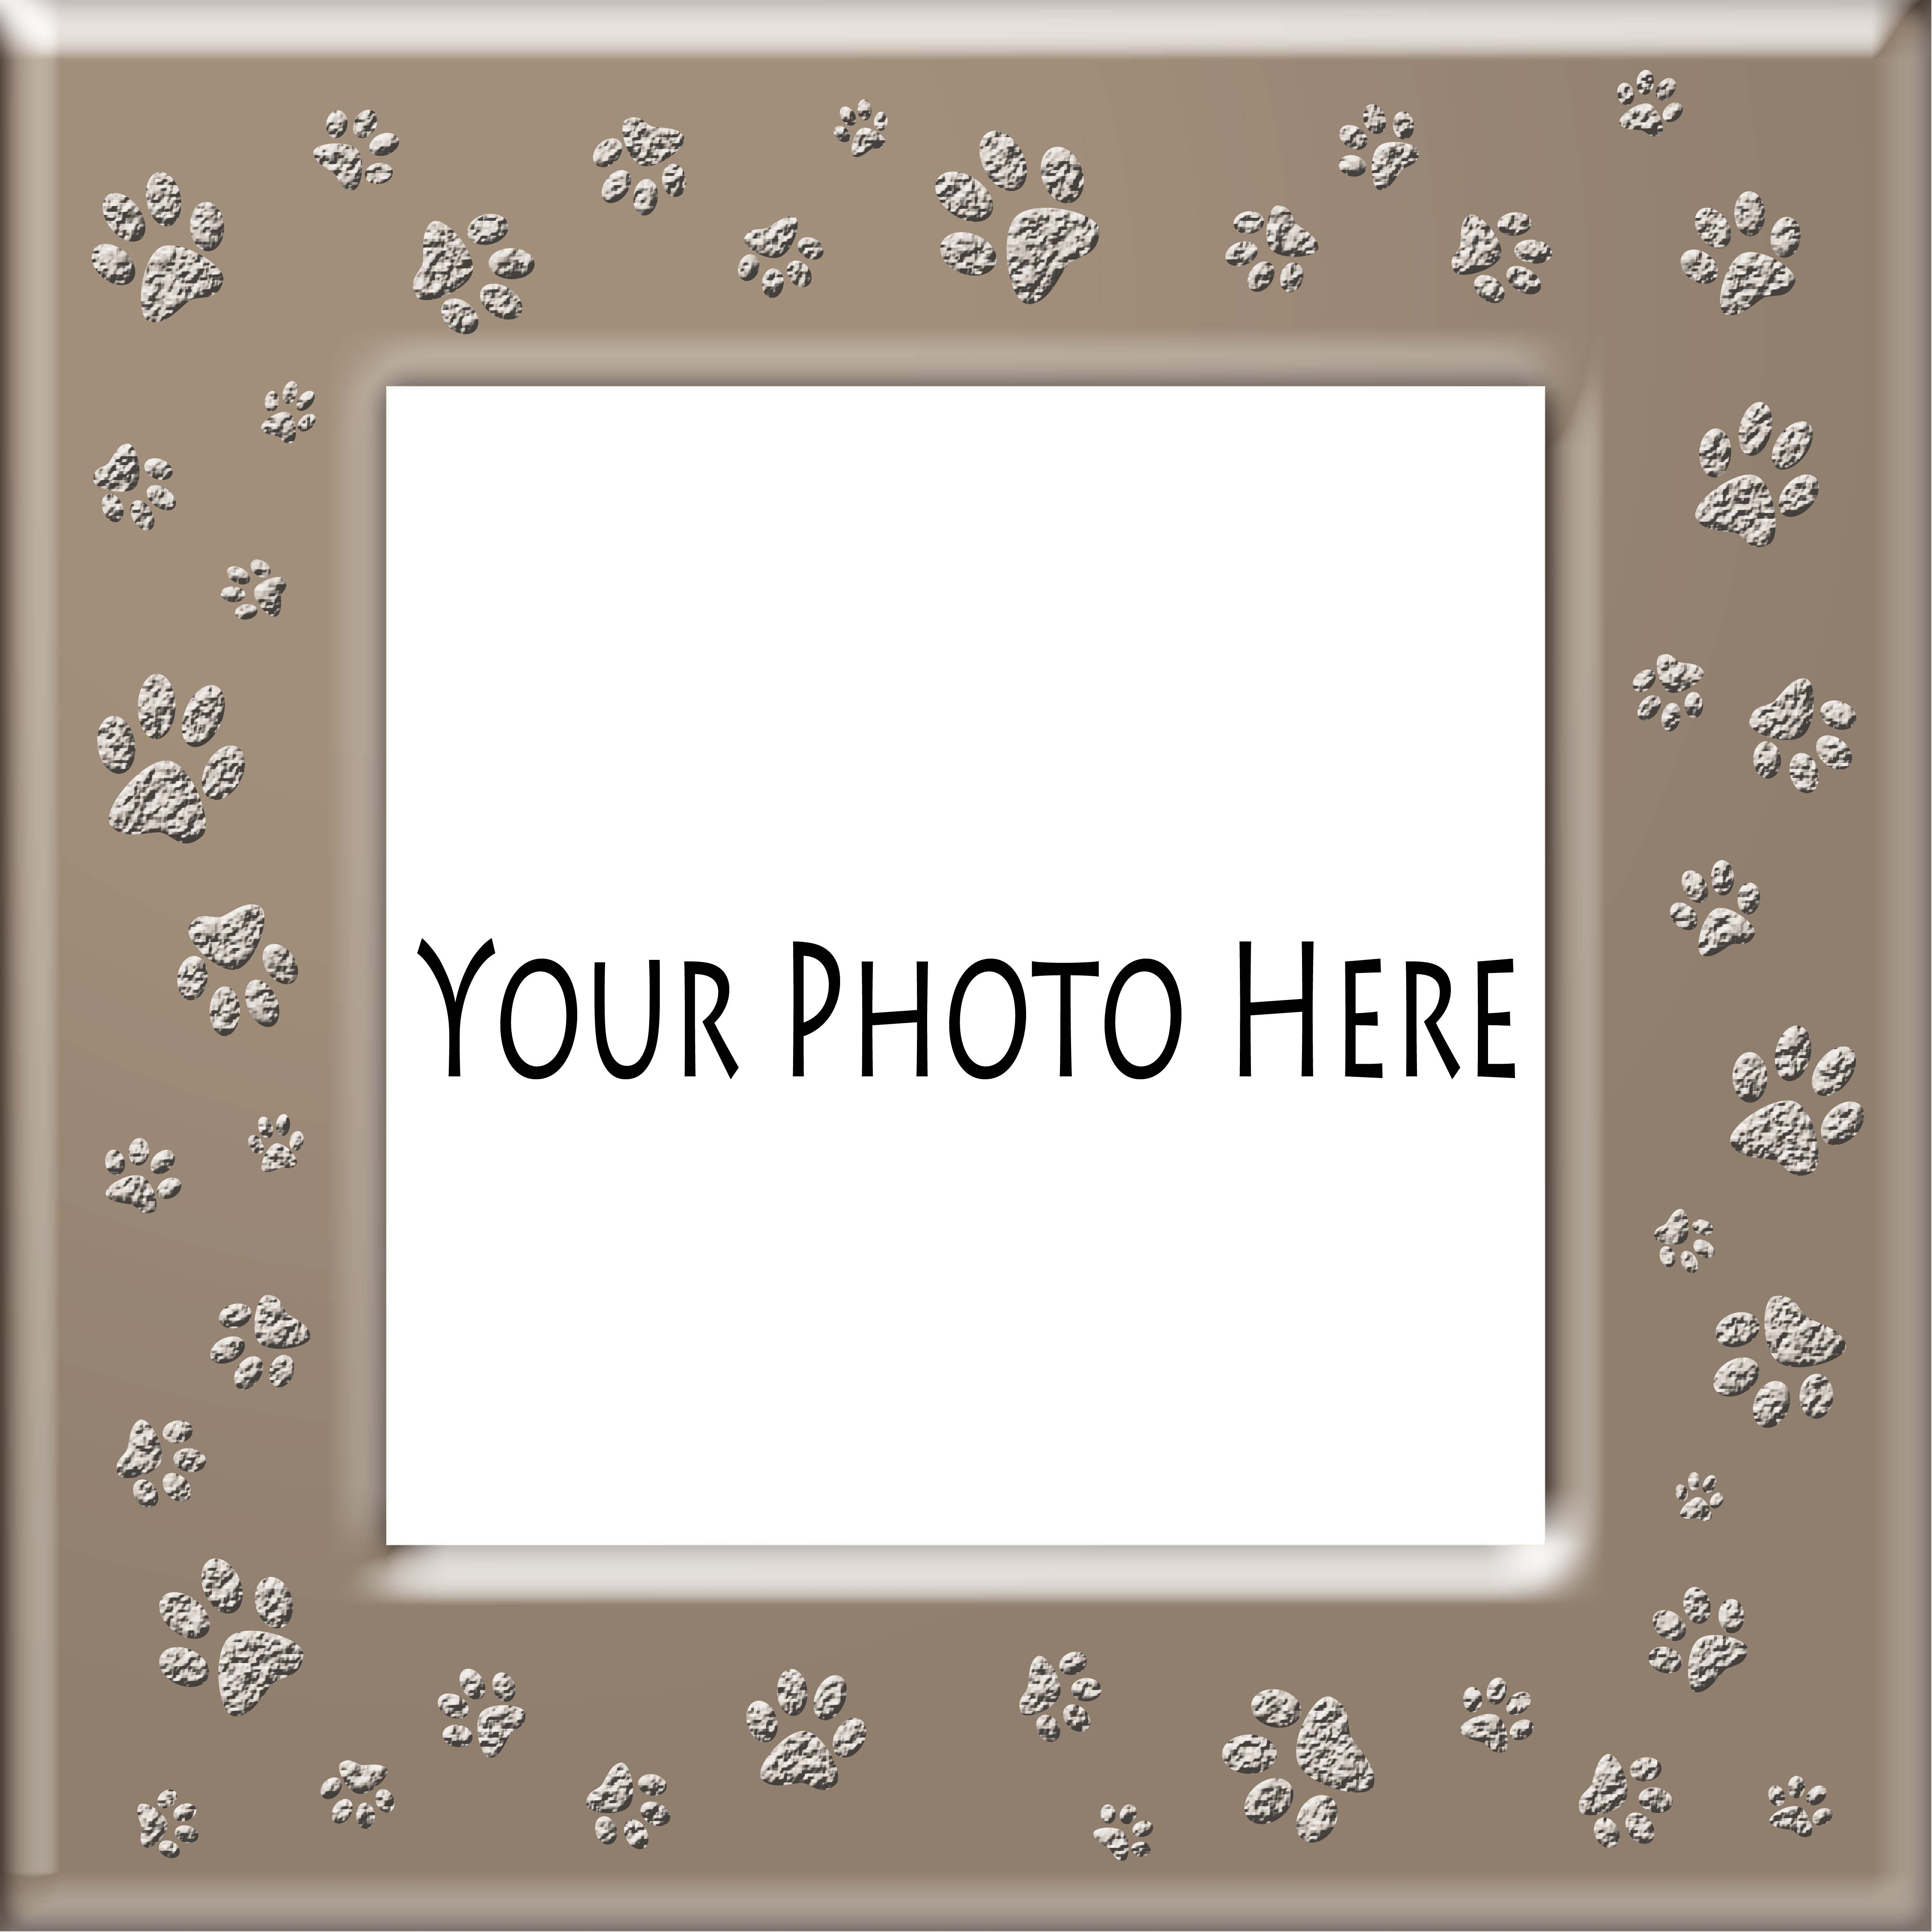 add-pet-photo-inside-tan-paws- frame#1